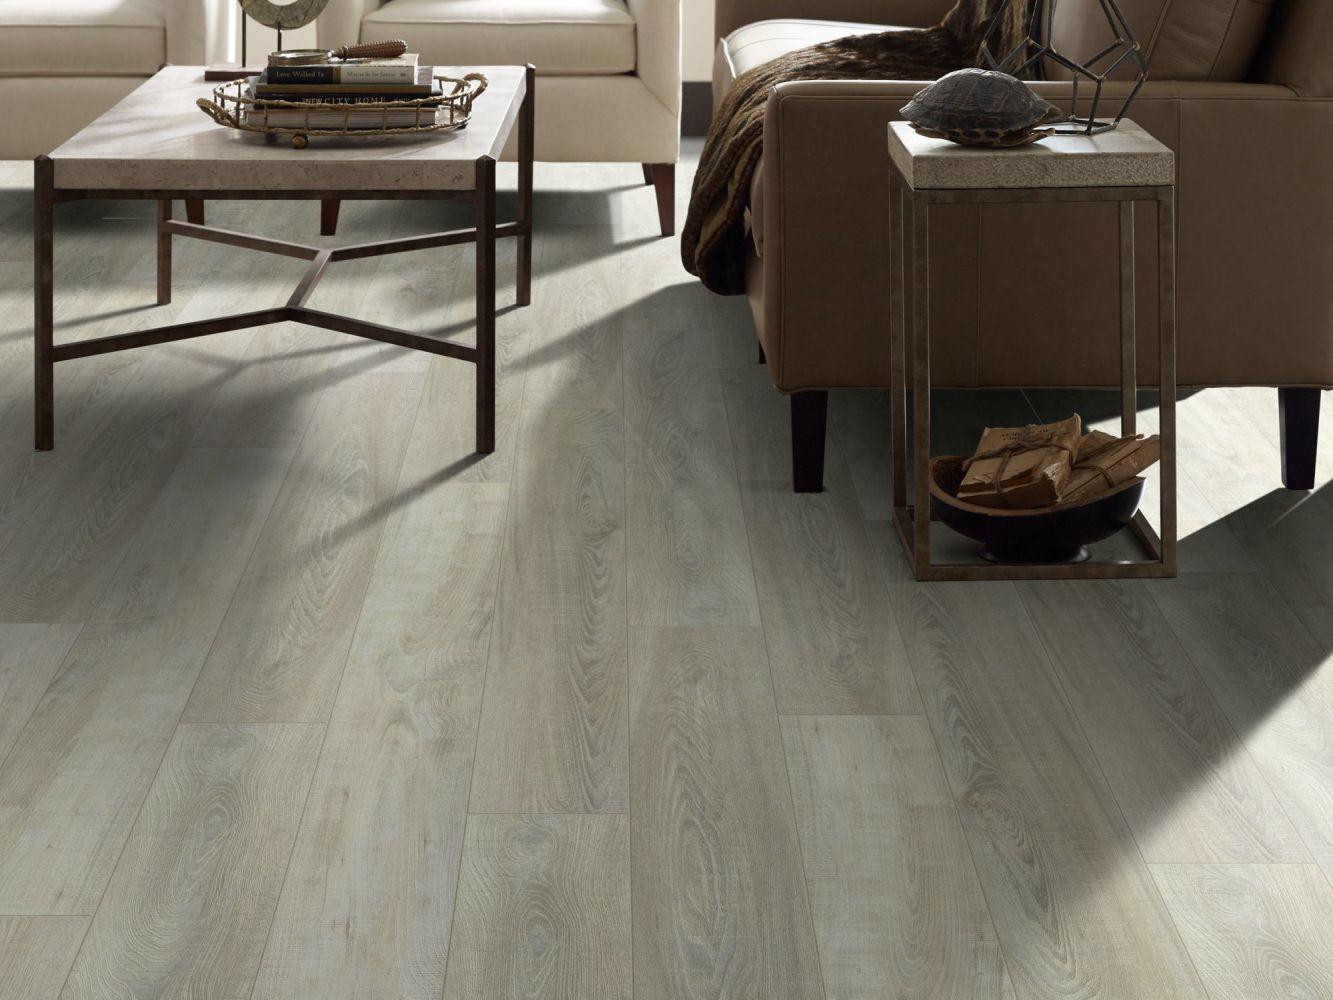 Shaw Floors Resilient Residential Virginia Trail HD Plus Tufo 00589_FR614